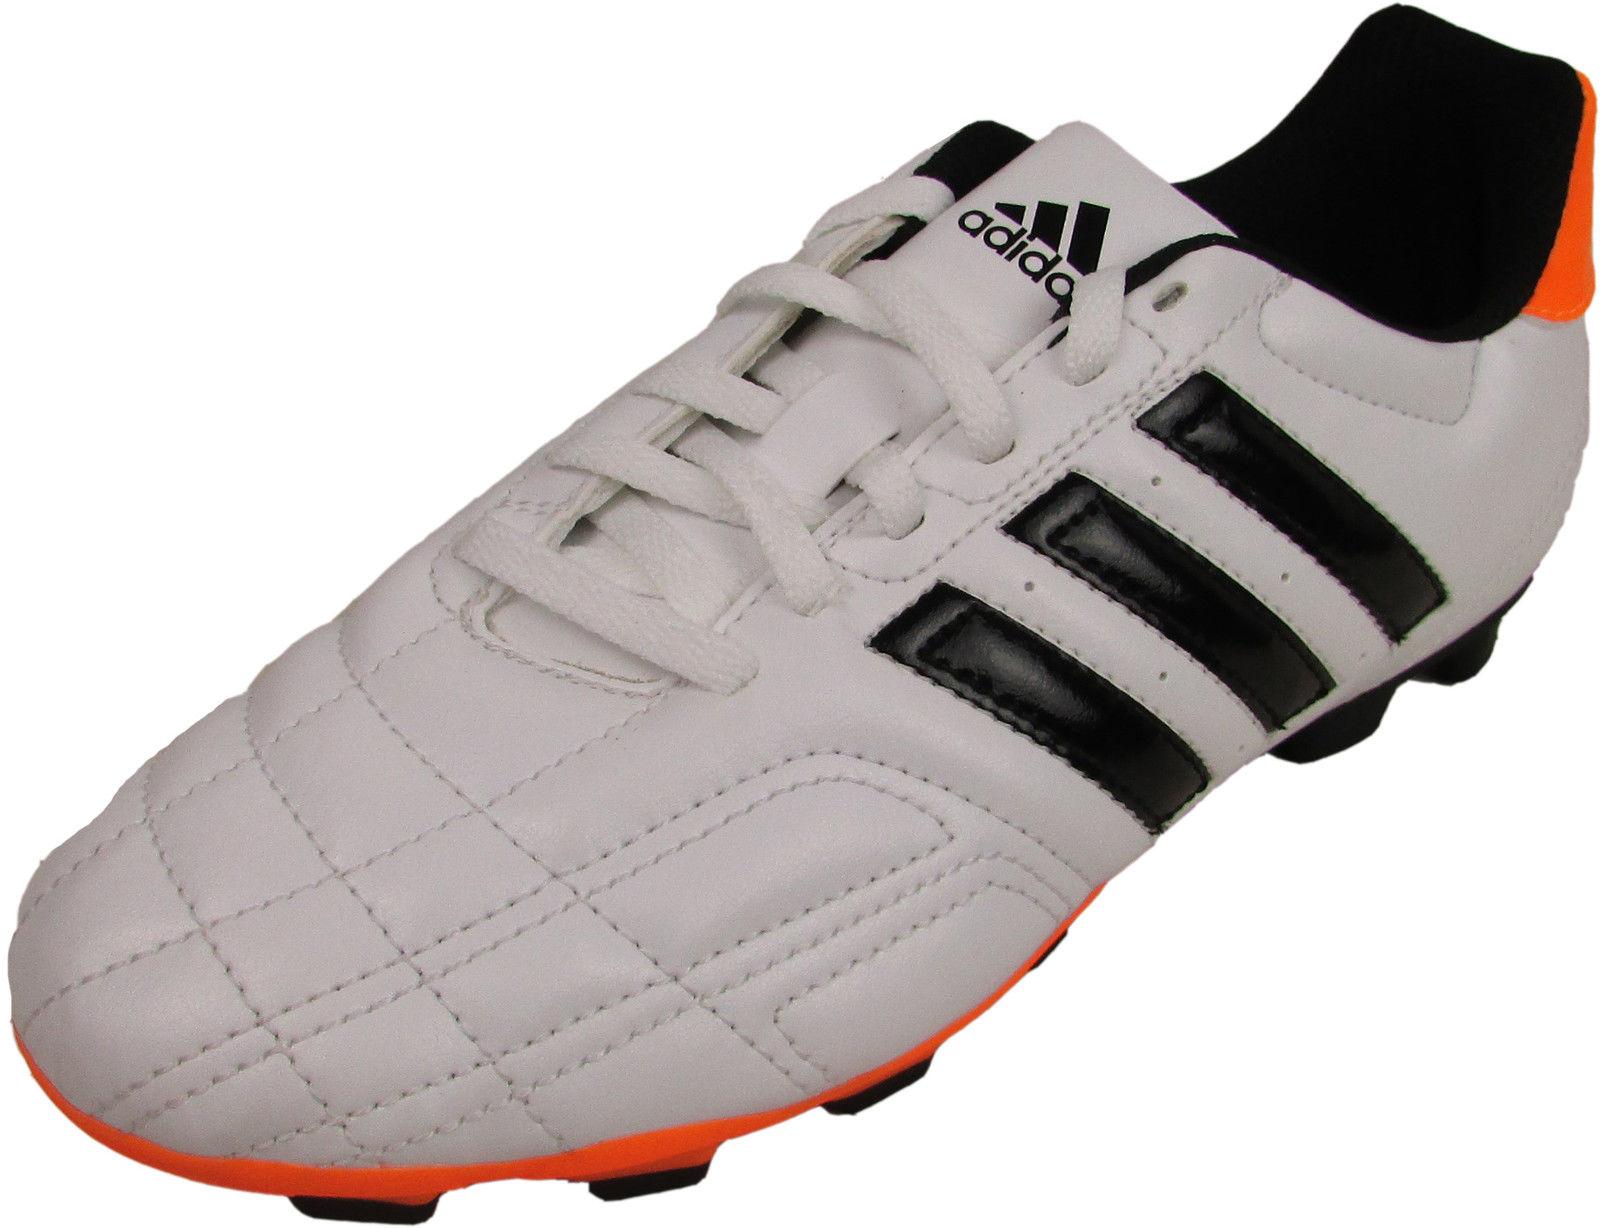 Boys Adidas FG Firm Ground Football Boots Junior Sizes Soccer Boot Kids UK 8 -7 20c220e3b8a4